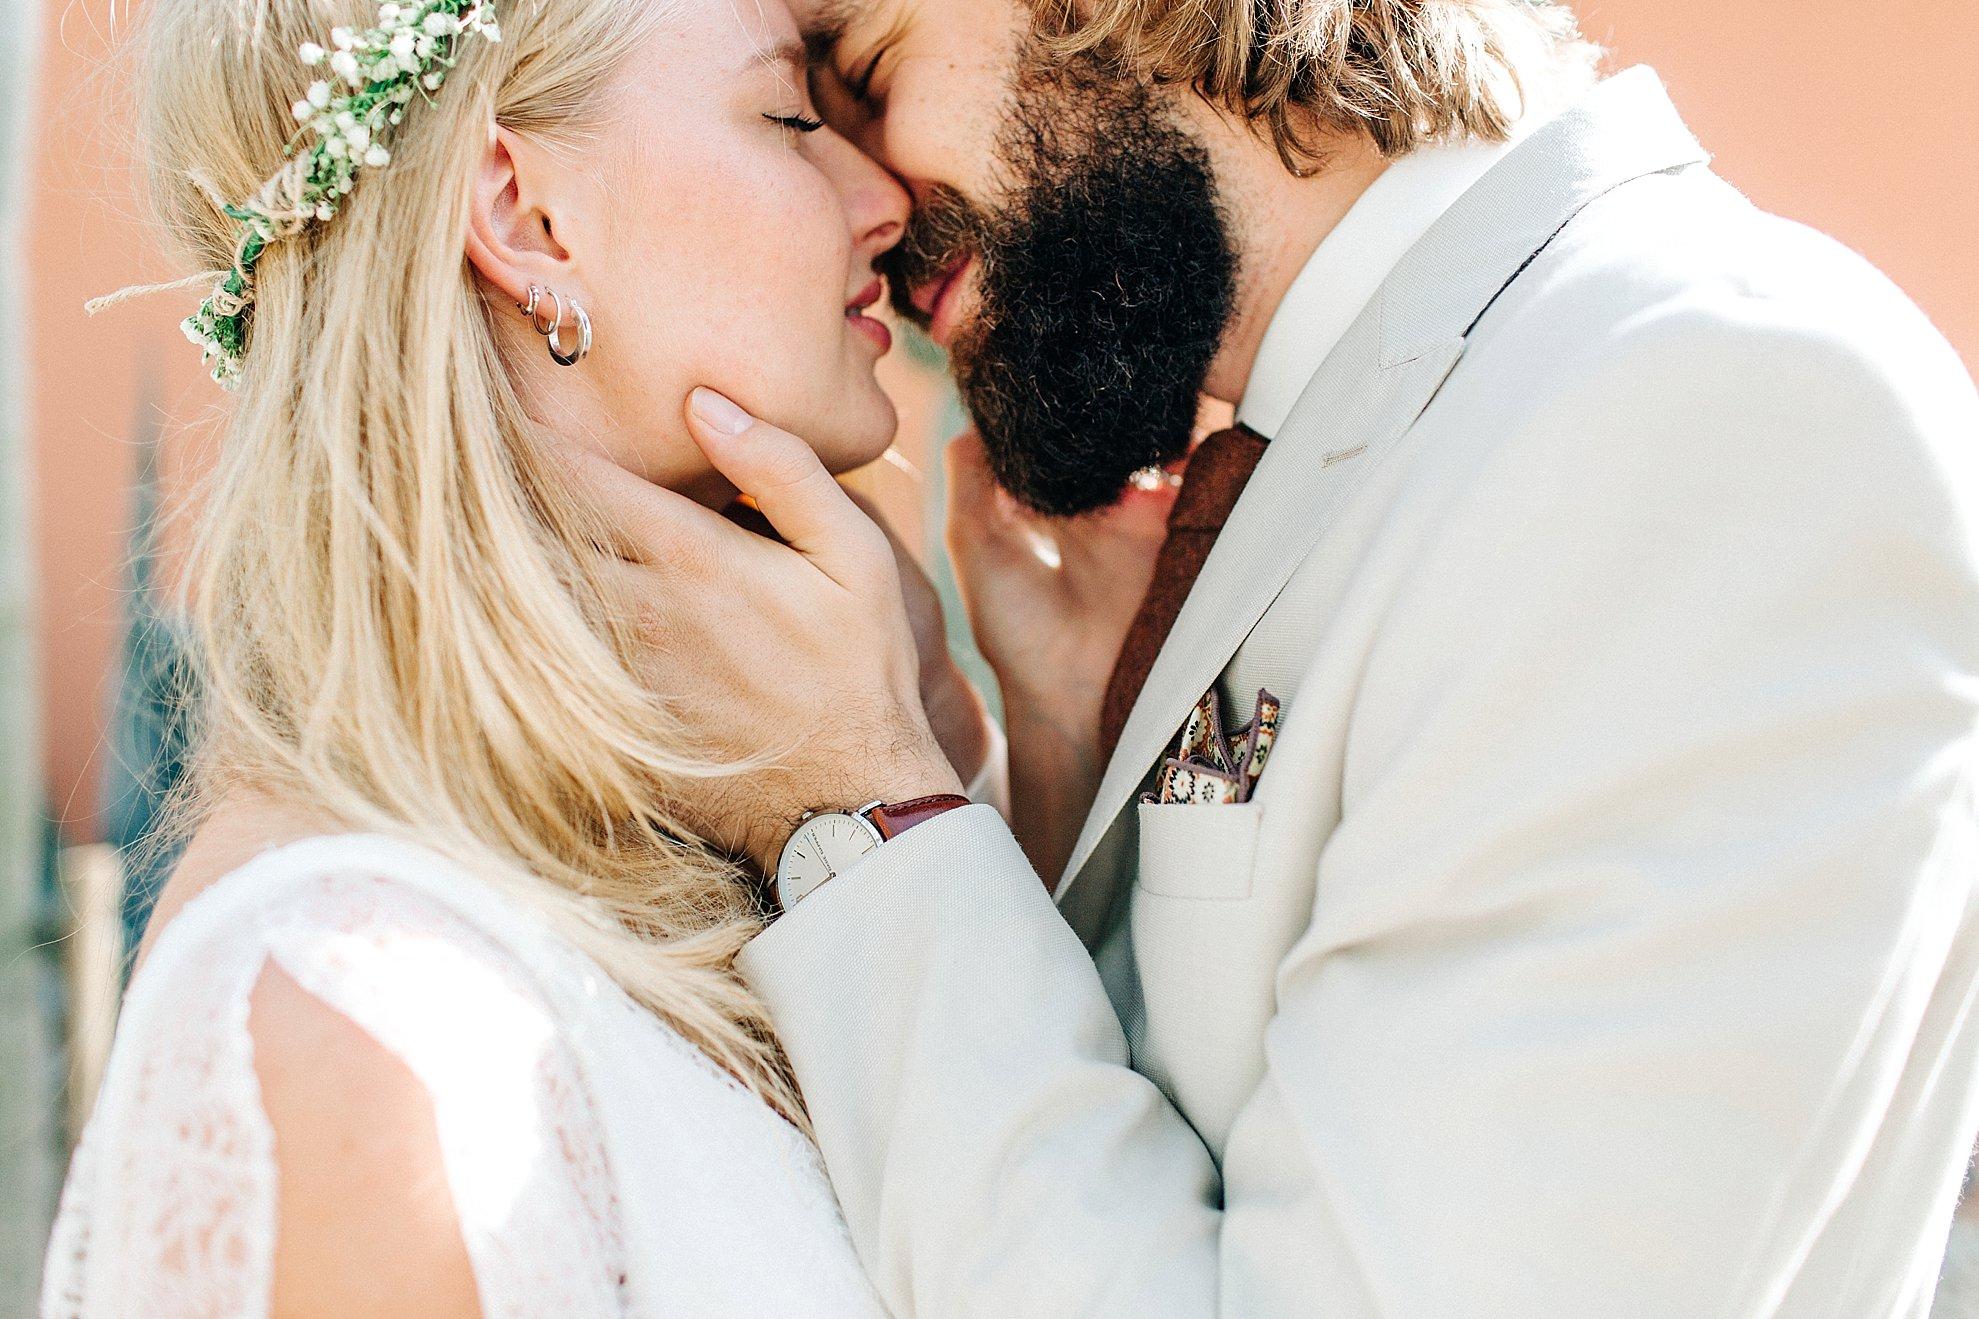 Amanda-Drost-photography-Hortus-Amsterdam-wedding_0009.jpg